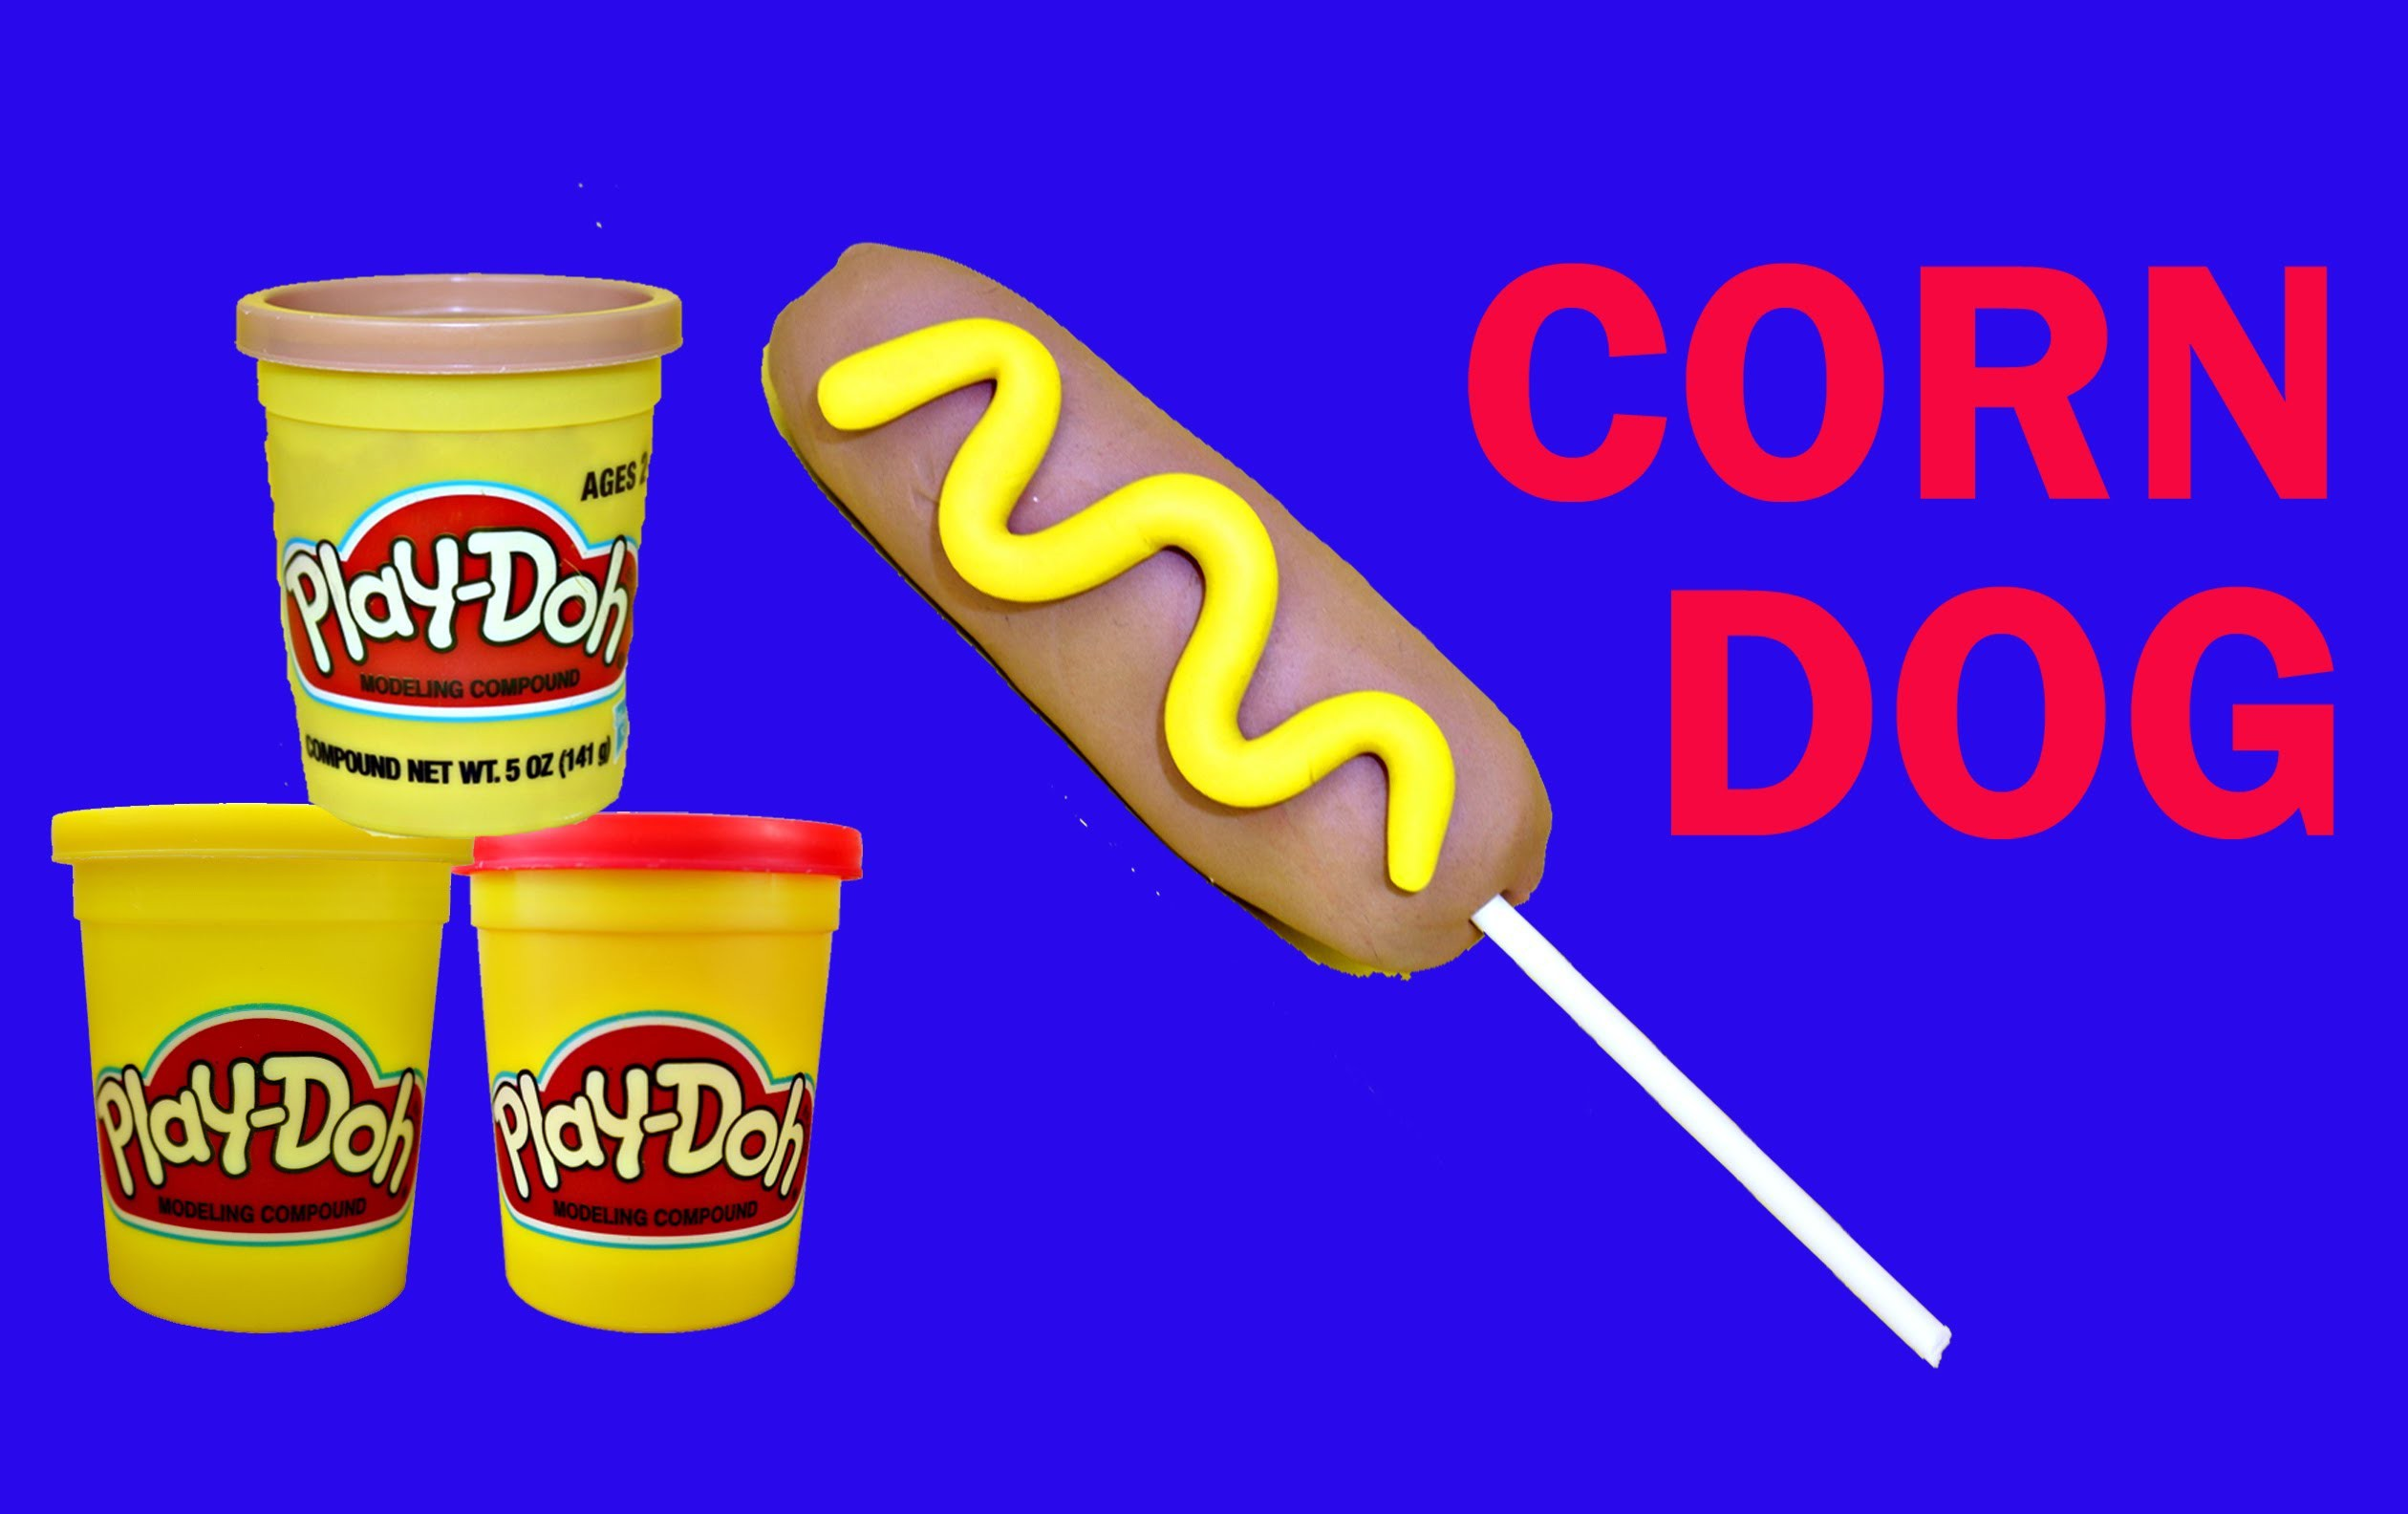 Play Doh Corn Dog Play Dough Hot Dog on a Stick Clay Food Tutorial DIY